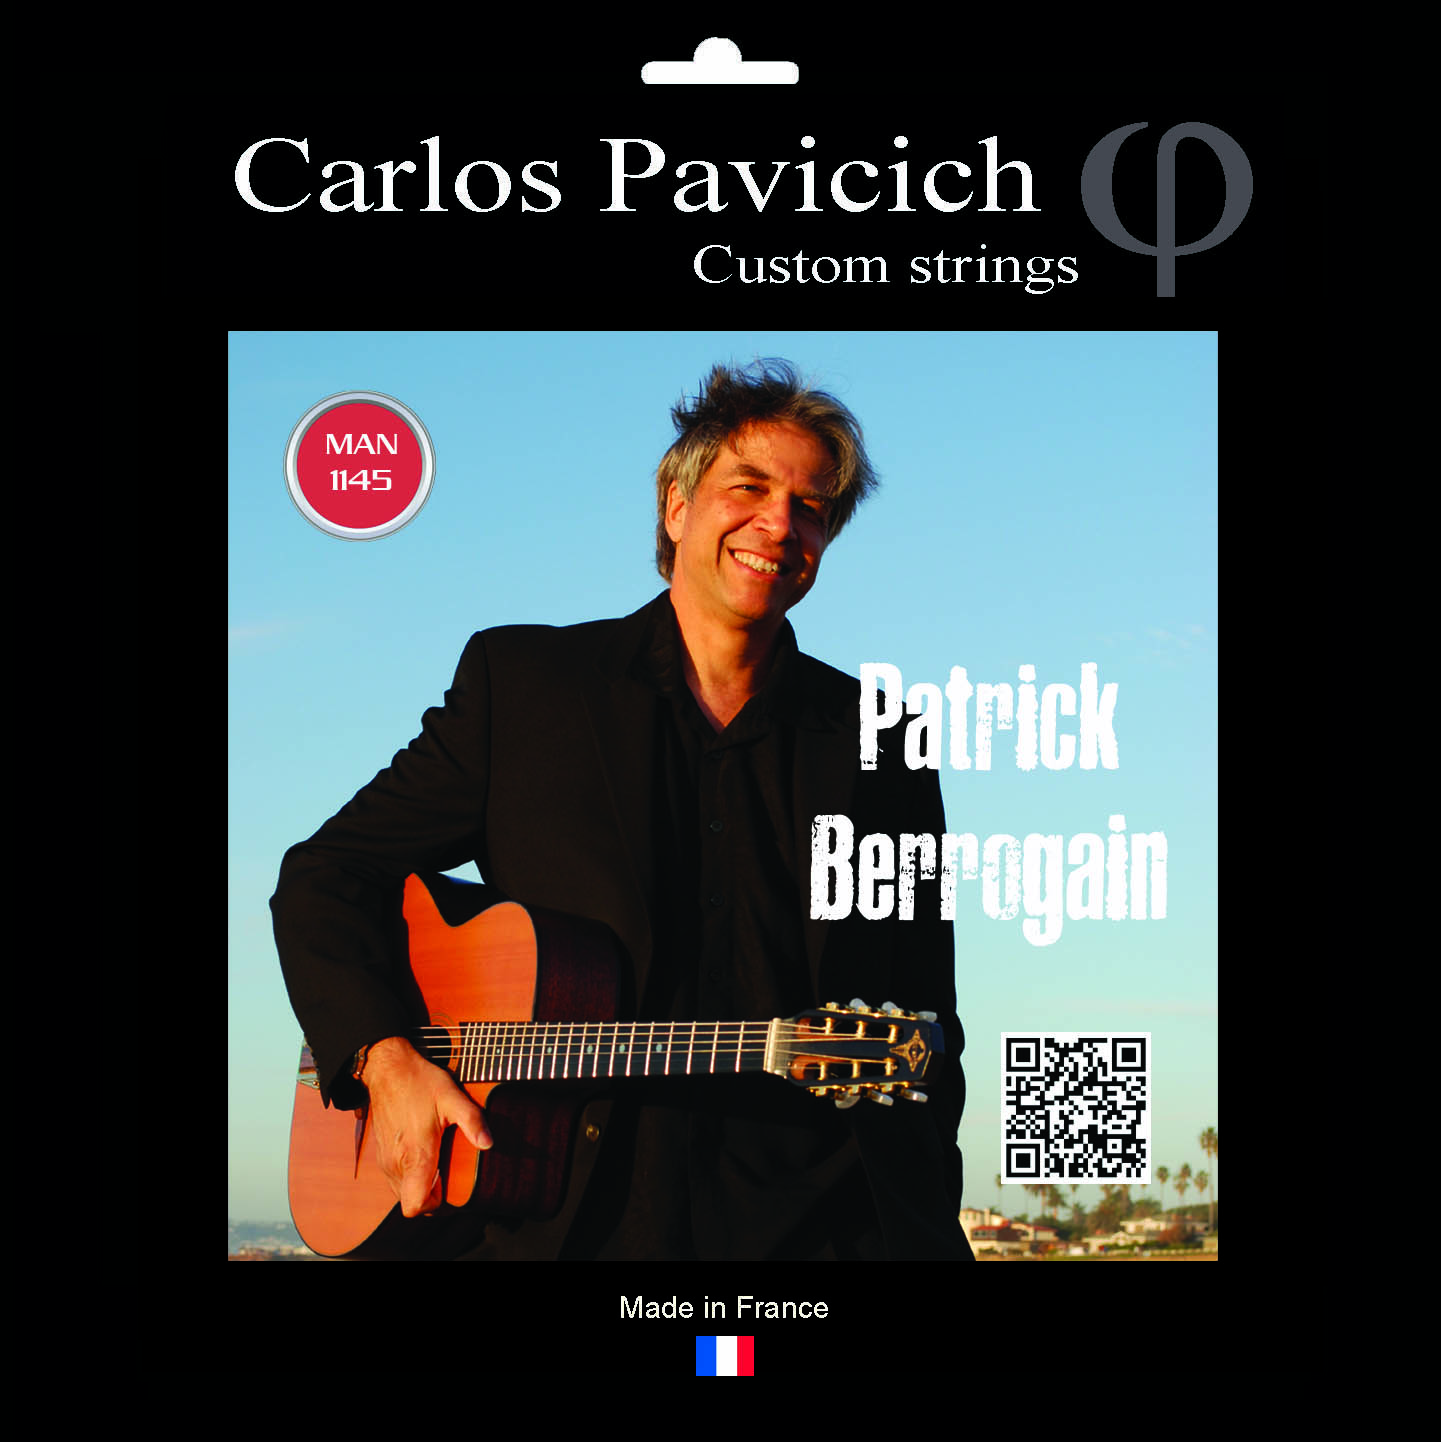 Patrick Berrogain